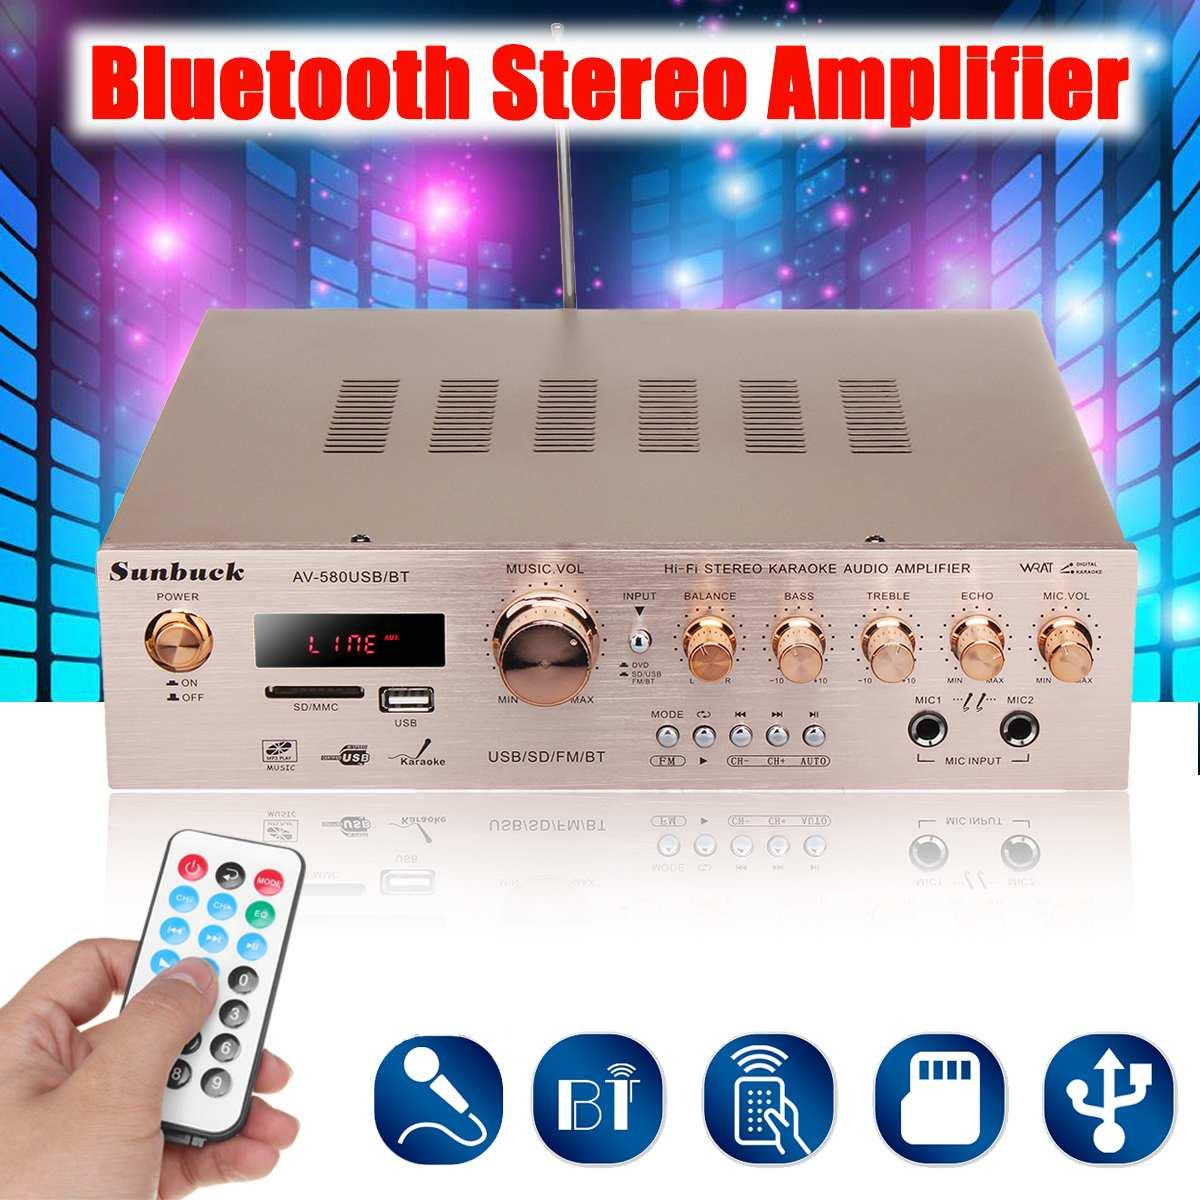 920W 220V 5CH bluetooth HiFi Stereo AV Surround Amplifier FM Karaoke Cinema Home Theater Amplifiers Home Amplifiers920W 220V 5CH bluetooth HiFi Stereo AV Surround Amplifier FM Karaoke Cinema Home Theater Amplifiers Home Amplifiers